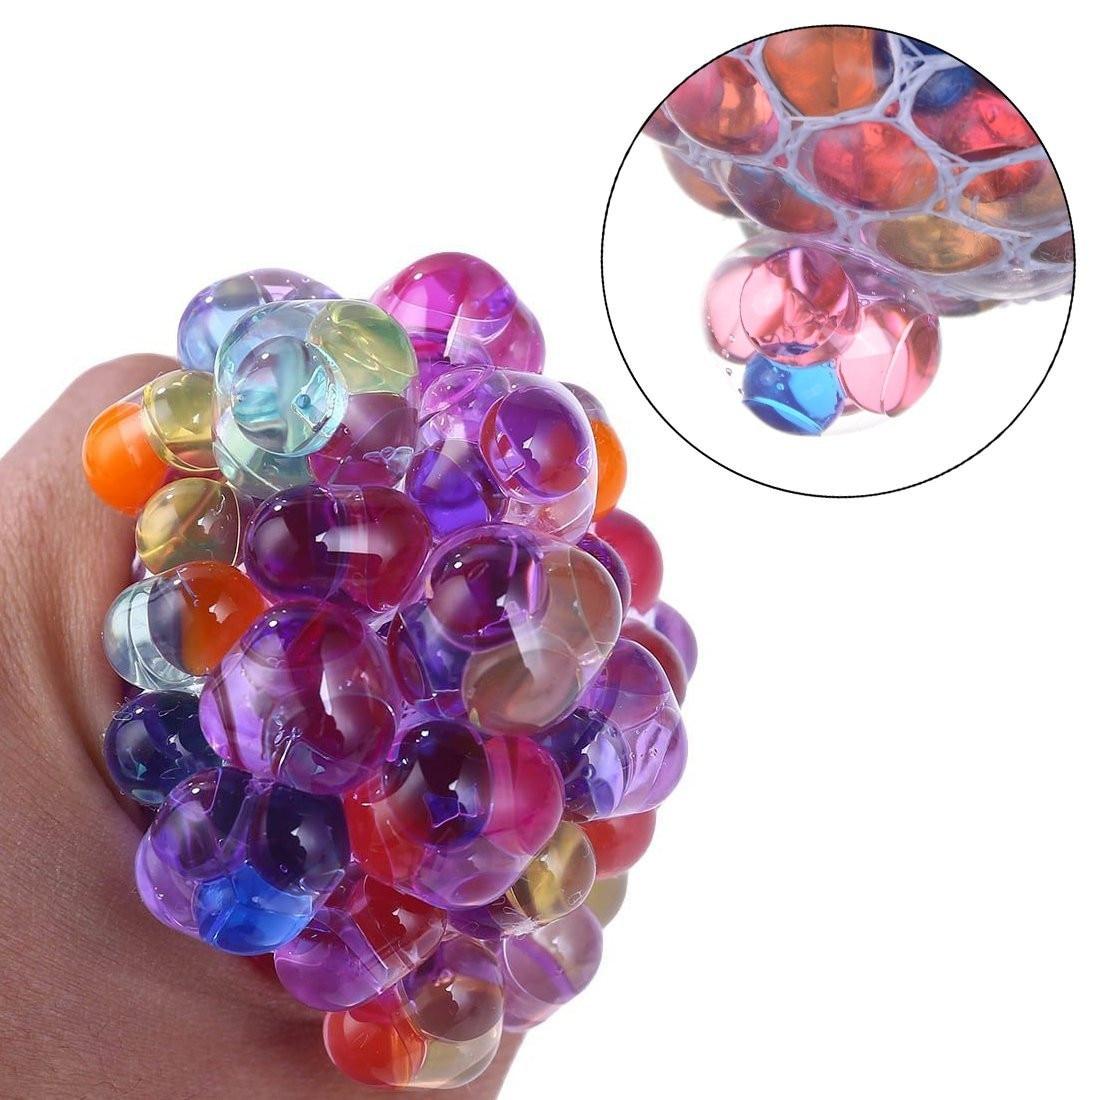 Divertido Anti-estrés squishy LED Bola de malla uva Squeeze sensorial Fruity novedad juguetes niños y adultos jugar Vent Rainbow Ball toy